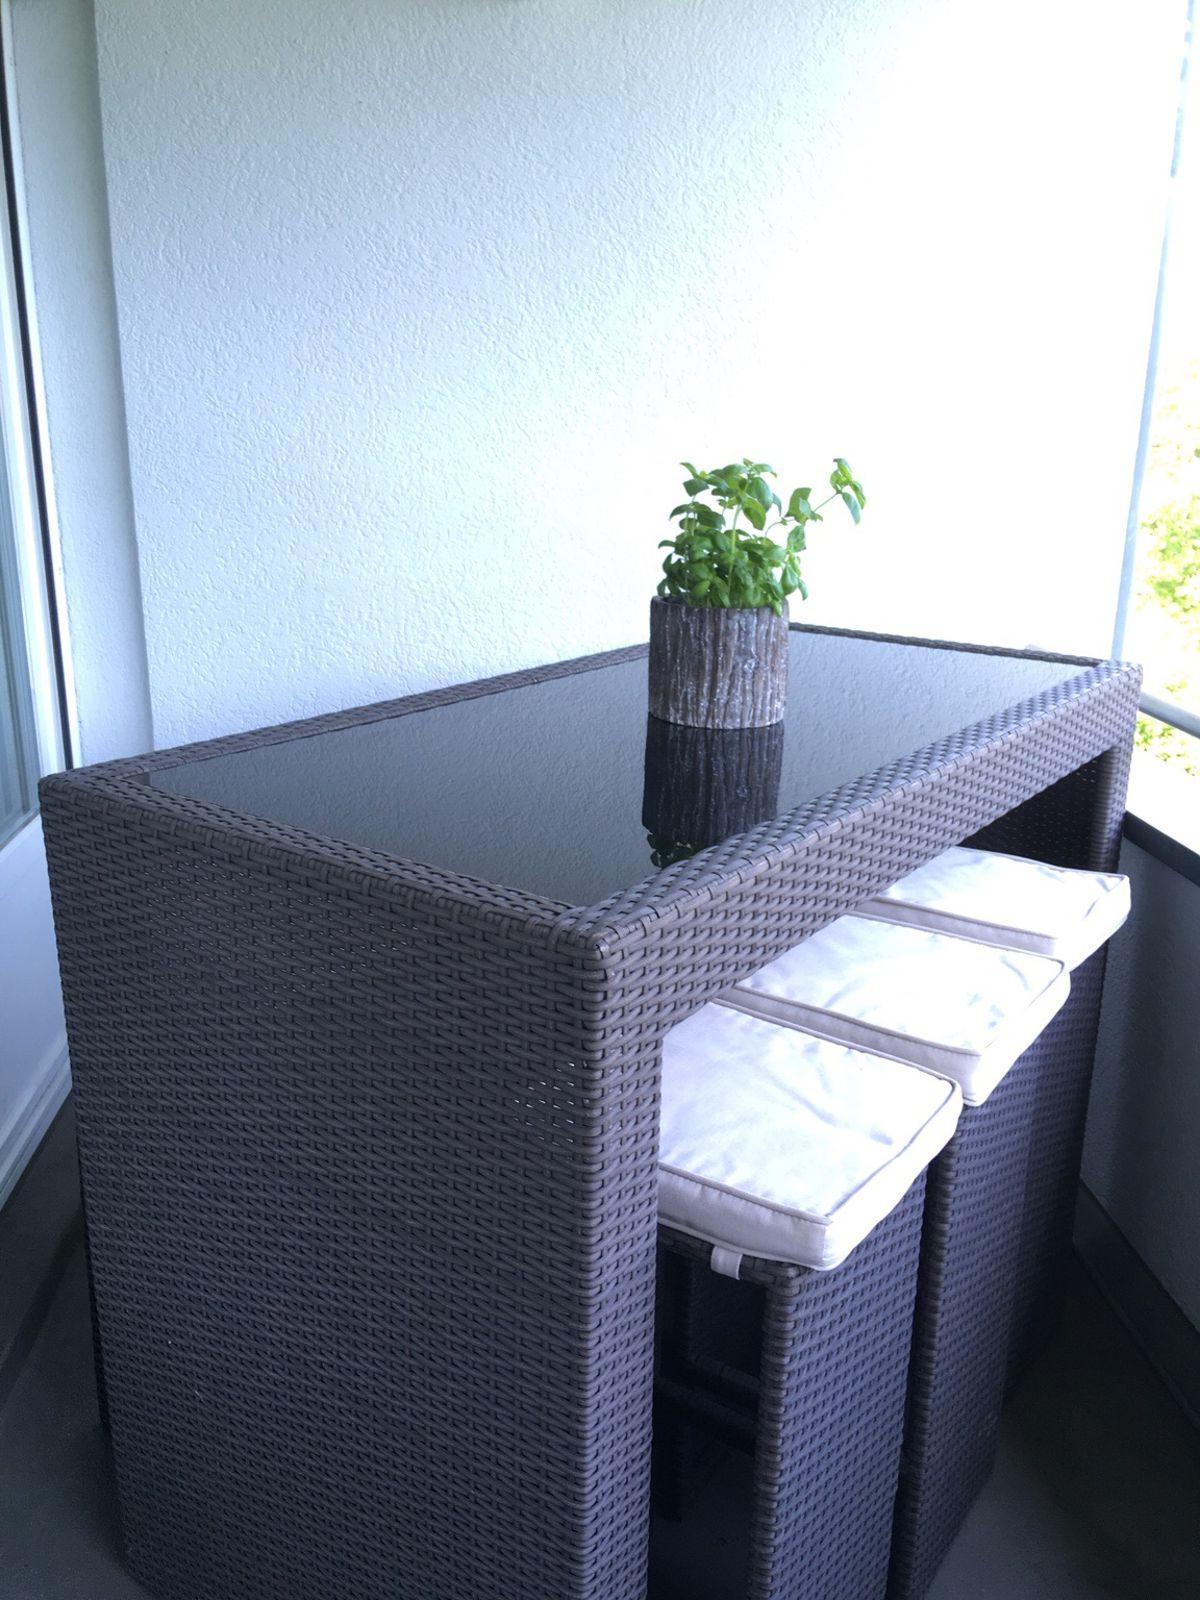 sitz lounge fur terrasse garten balkon in 6840 gotzis fur on1fjus6 of sessel modern chillen im lounger